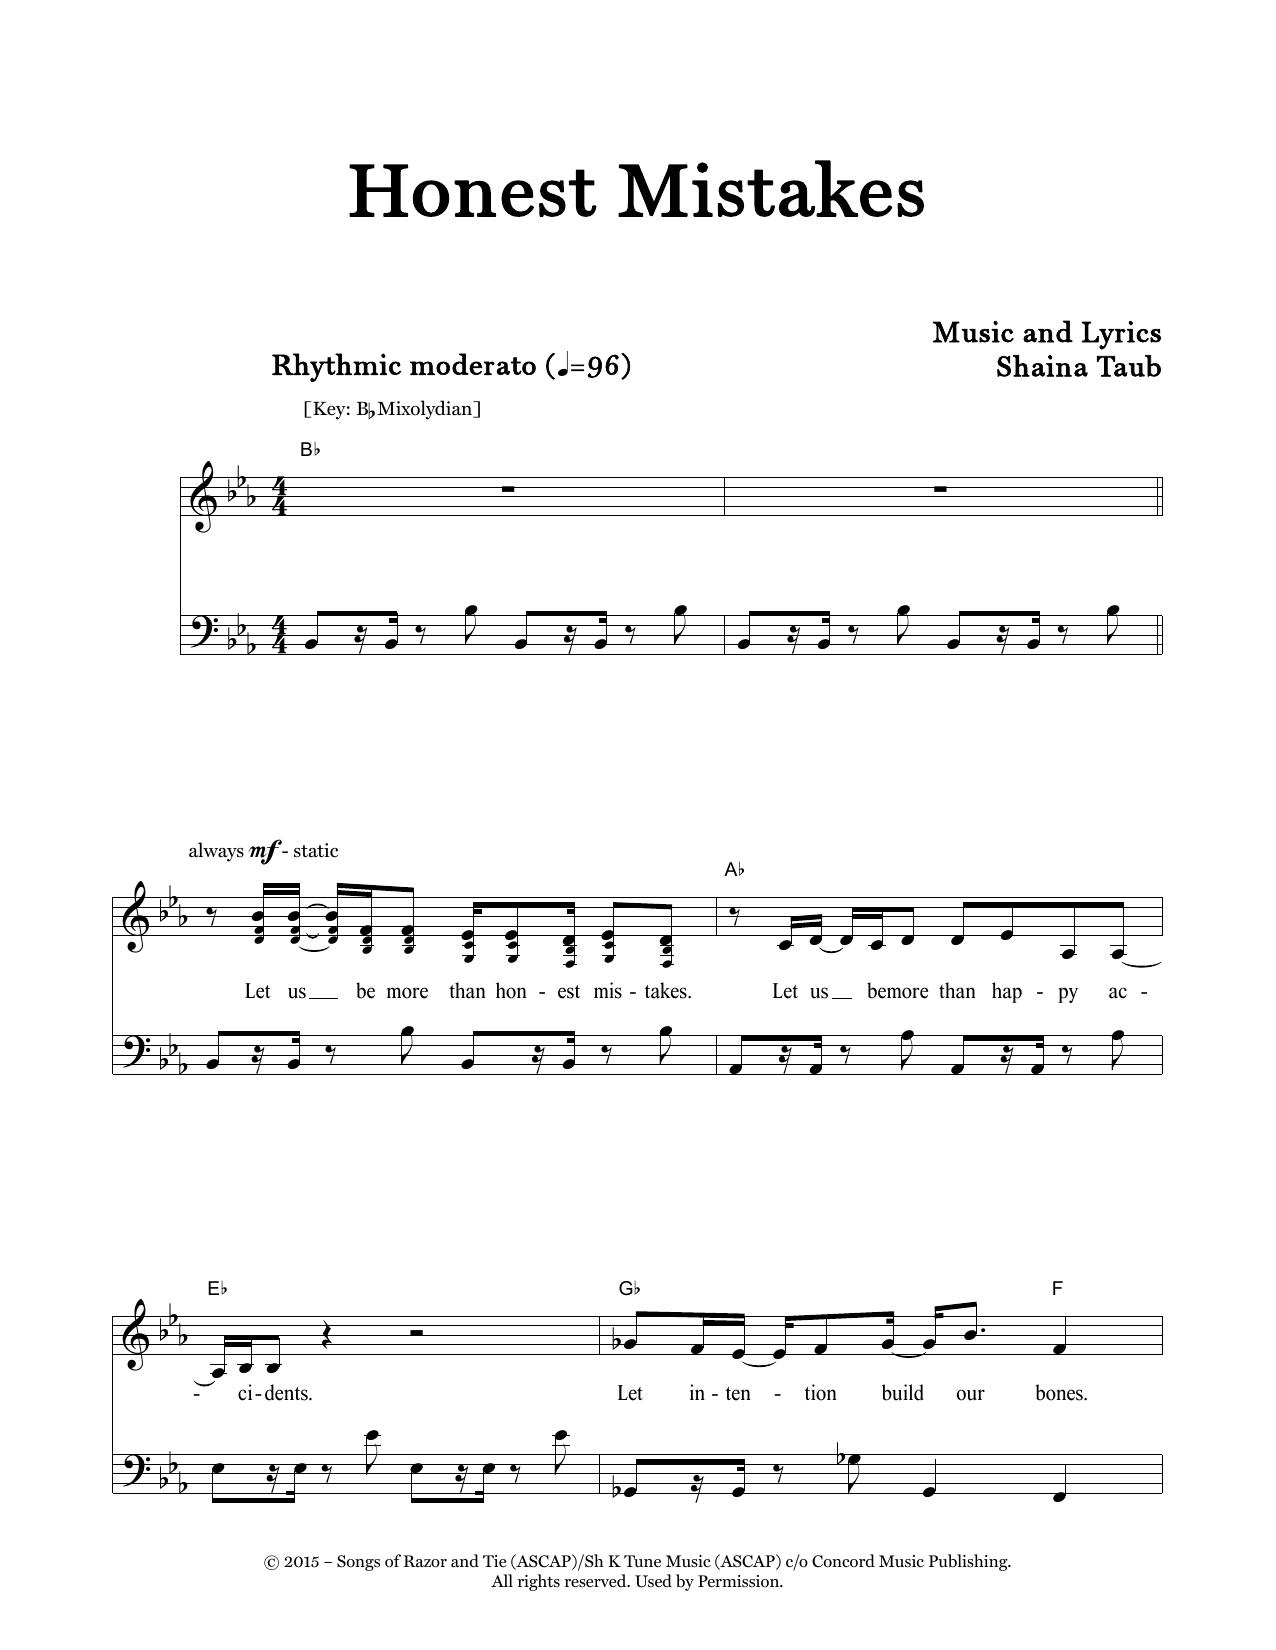 Honest Mistakes Sheet Music